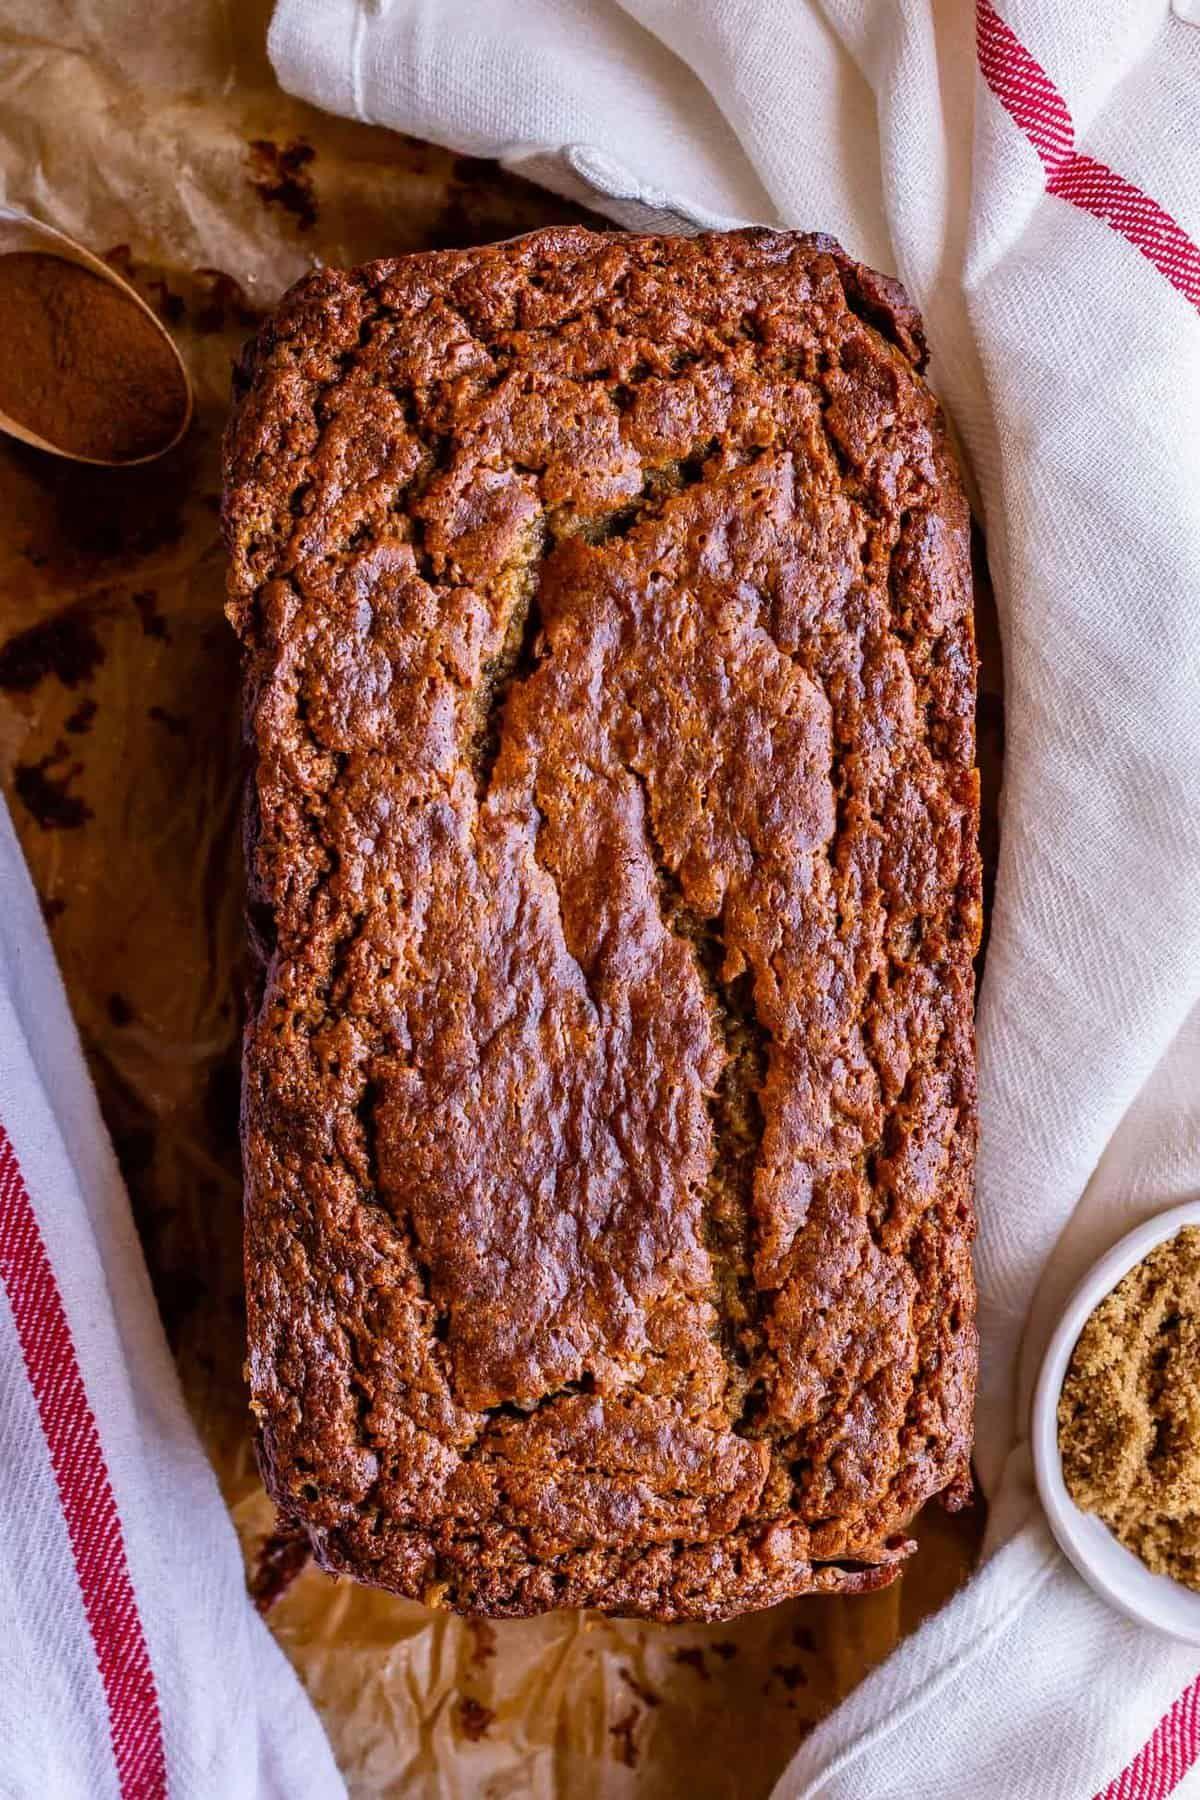 Moist Banana Bread With Sour Cream From The Food Charlatan The Moist Banana Bread R In 2020 Moist Banana Bread Banana Bread Recipe Easy Moist Super Moist Banana Bread